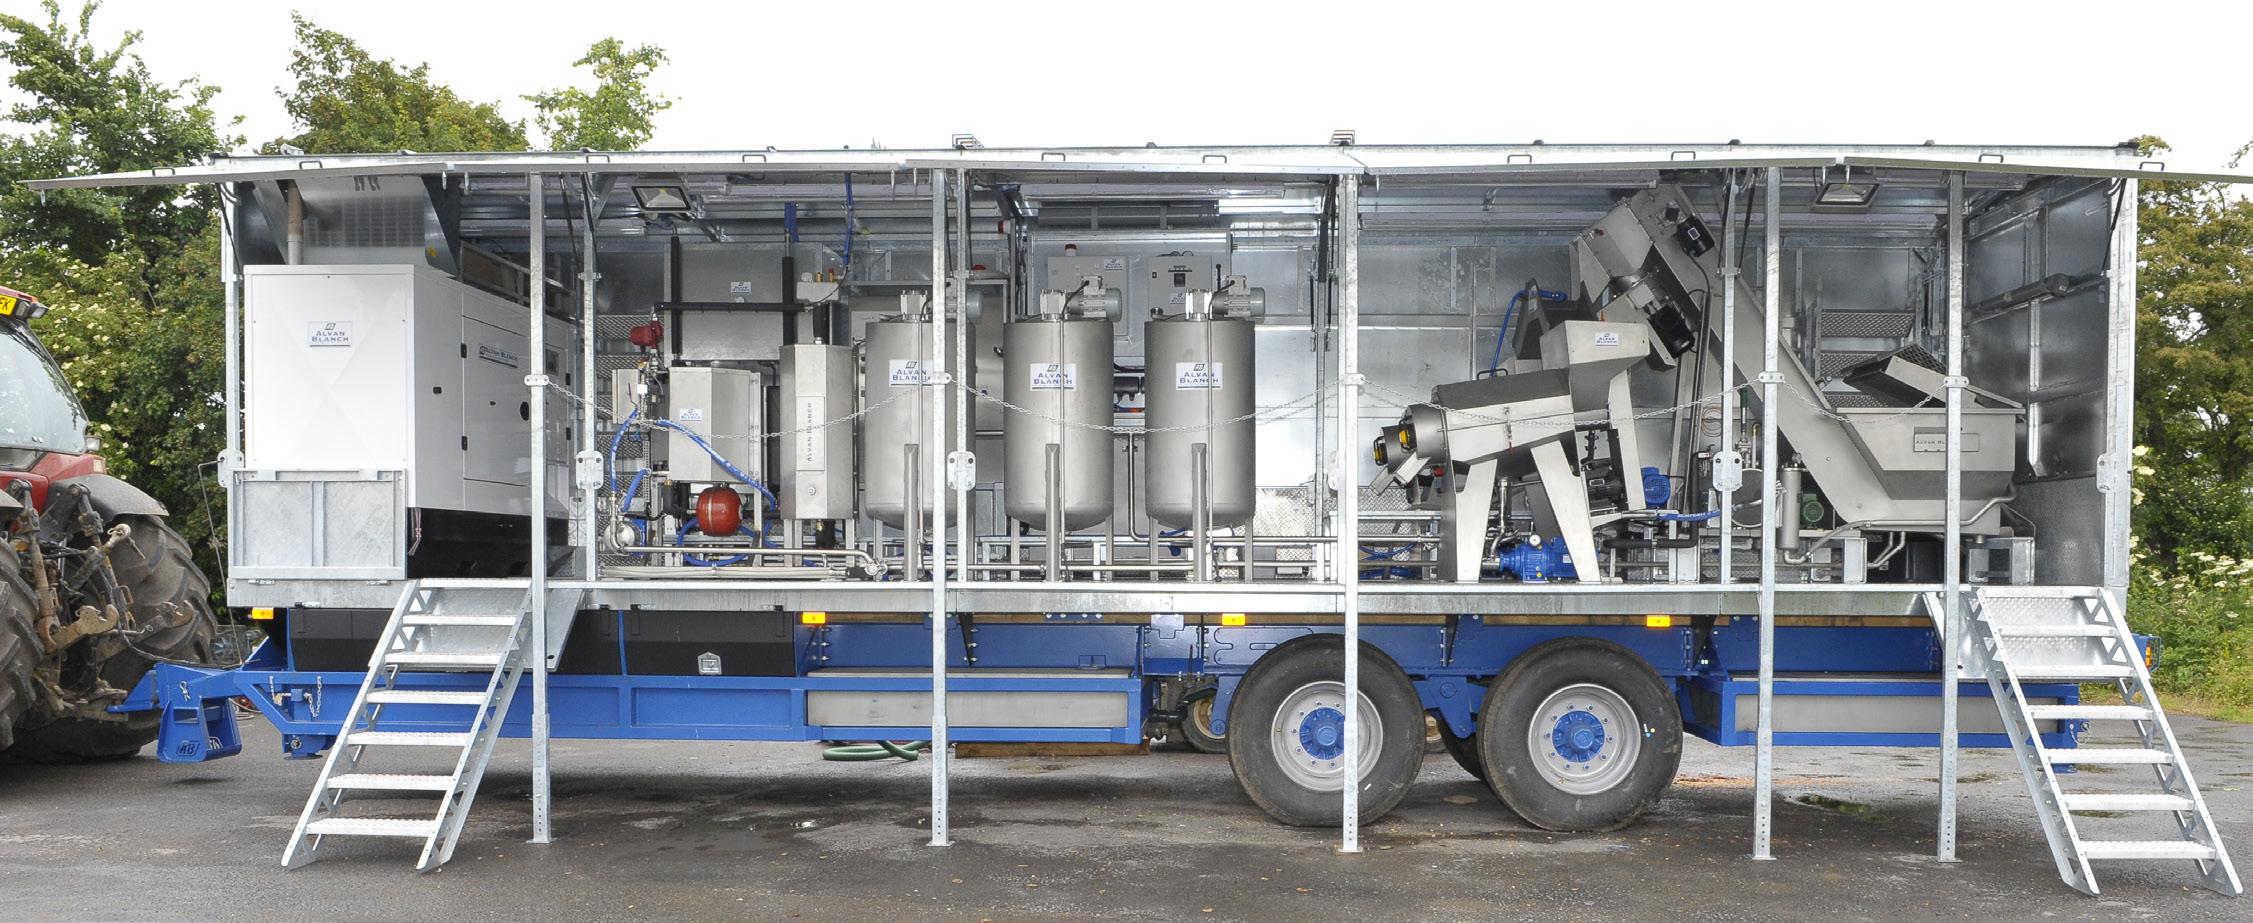 Alvan Blanch Mobile Fruit Juice Processing System Nigeria Page 1 Image 0001